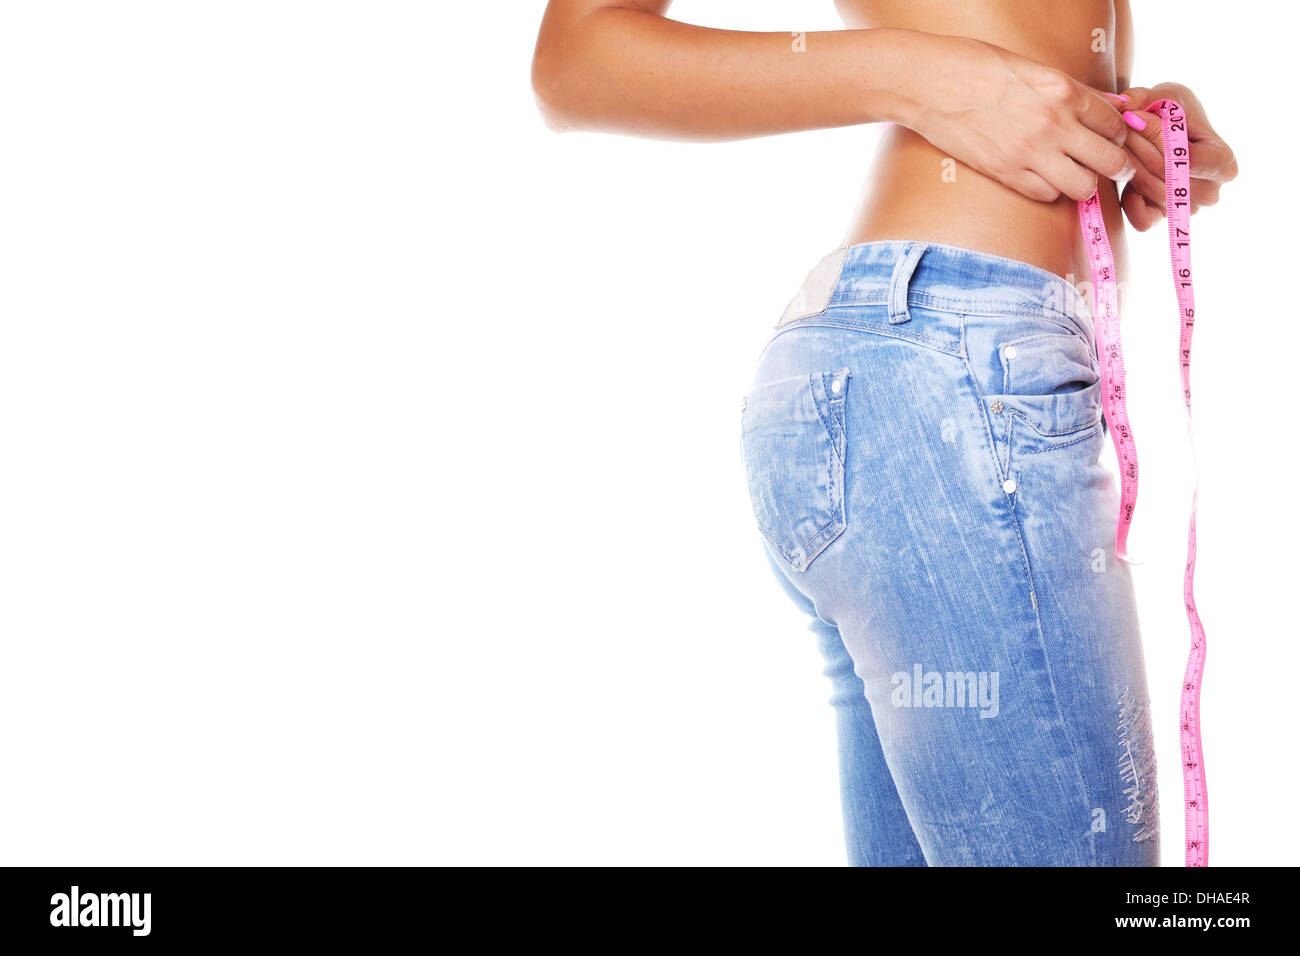 soin du corps femme Photo Stock